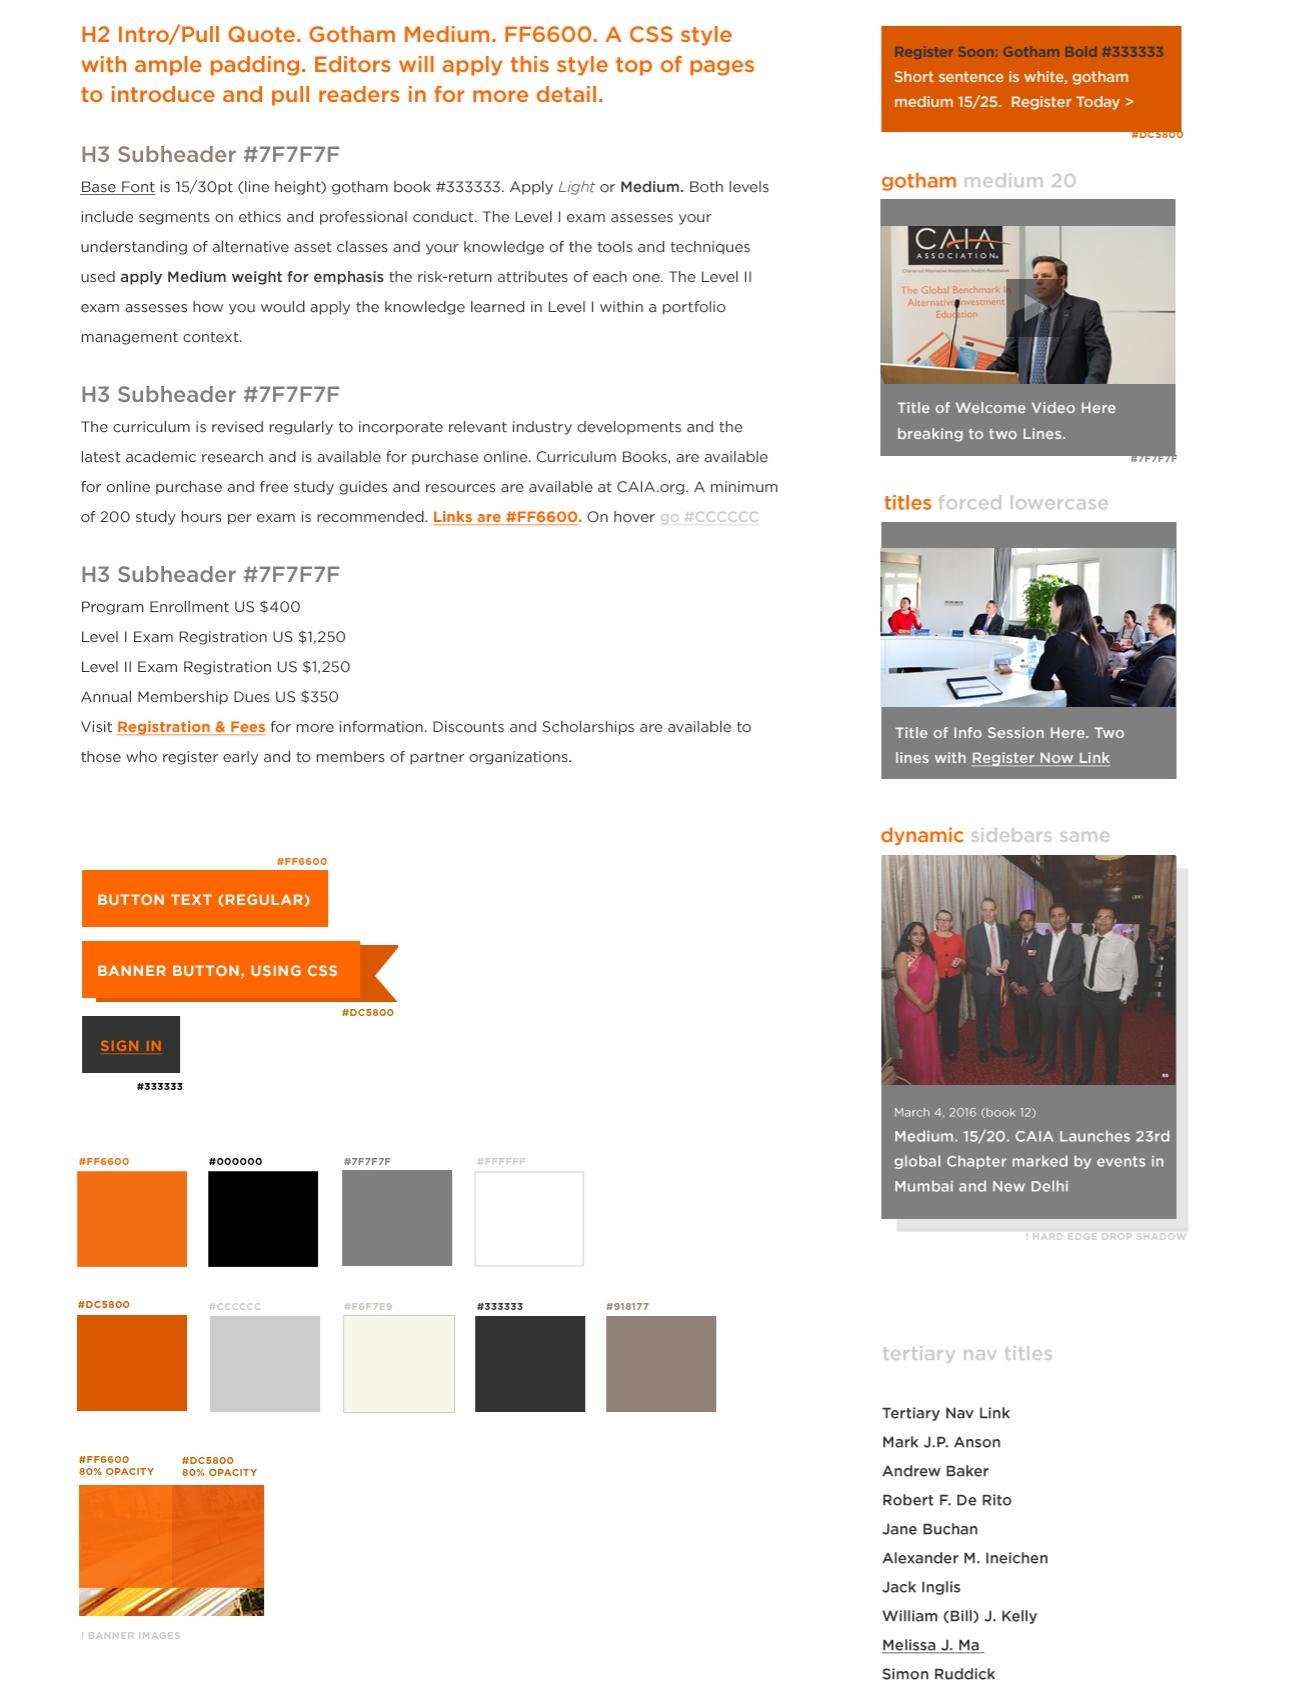 CSS_V2.jpg